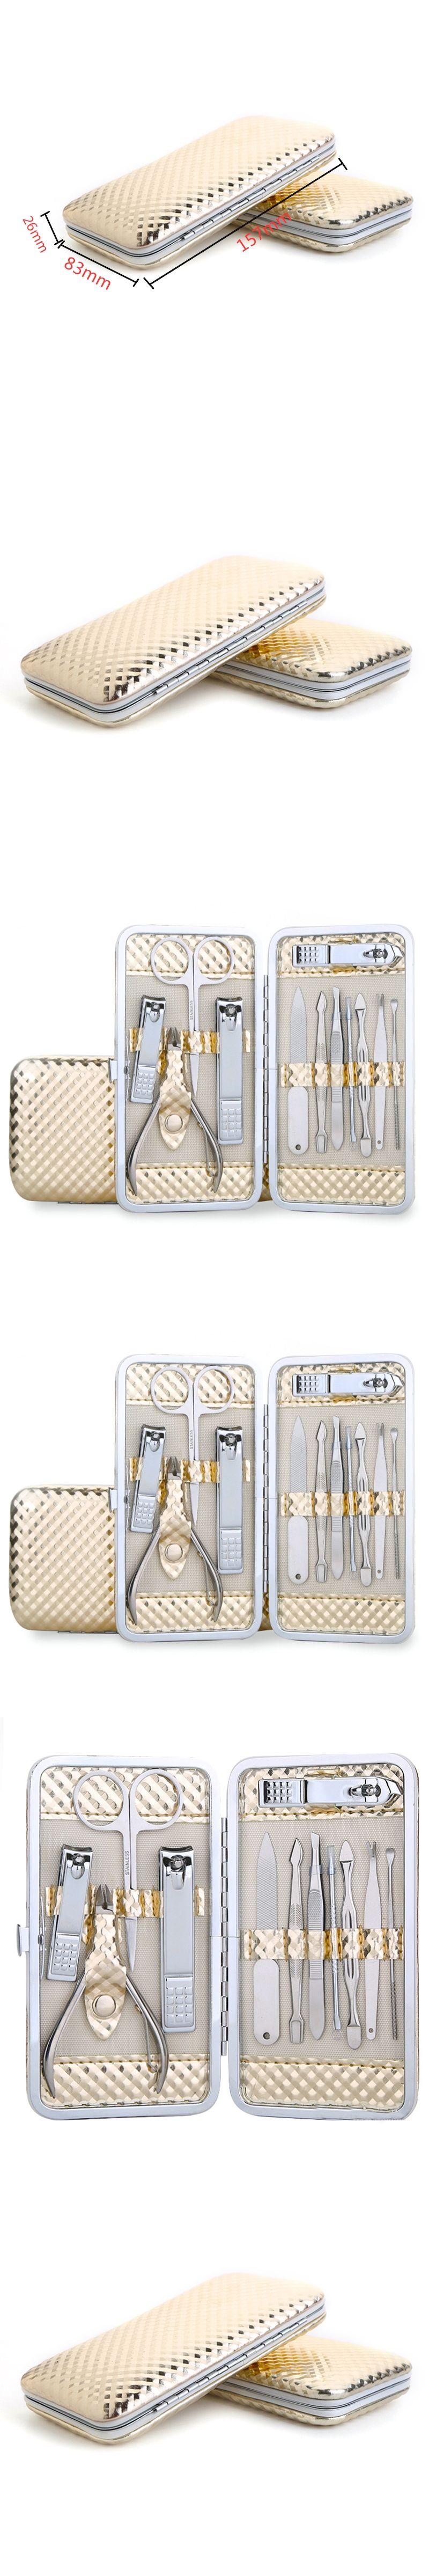 12Pcs/set Luxury Gold Nail Art Tools Kits with Storage Box Nail ...